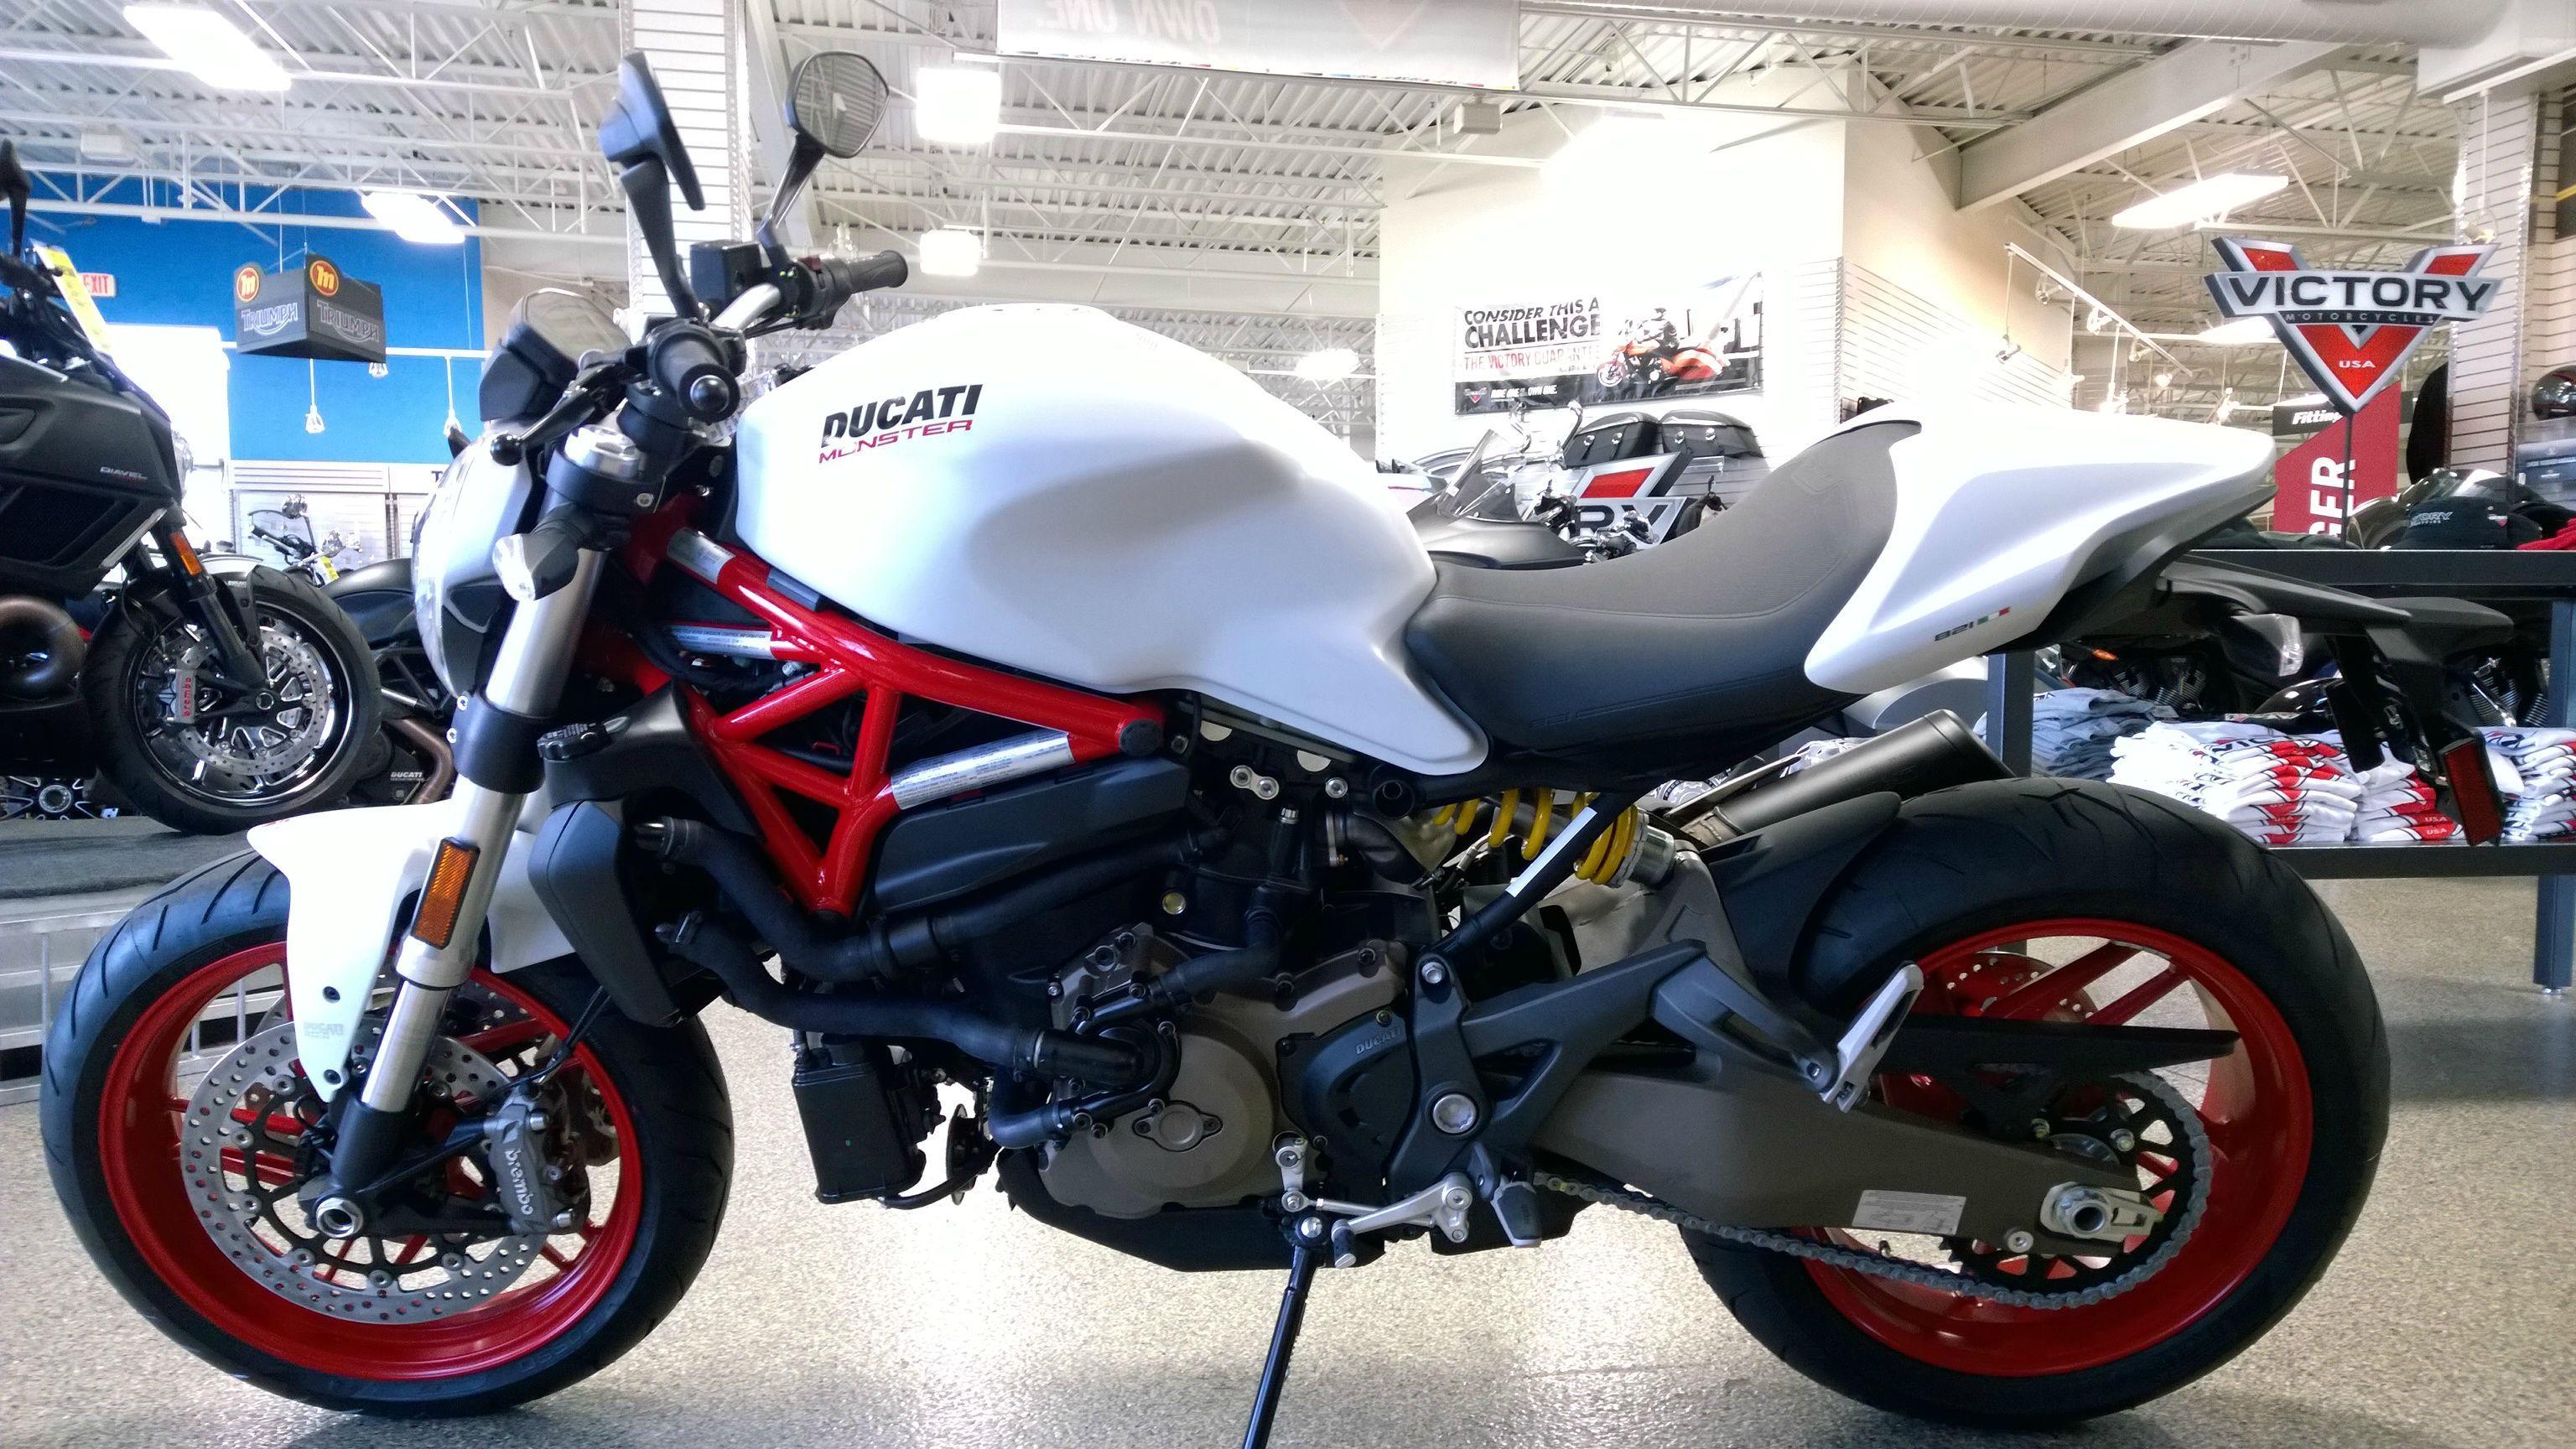 Ducati Monster Photos Motorcycle USA